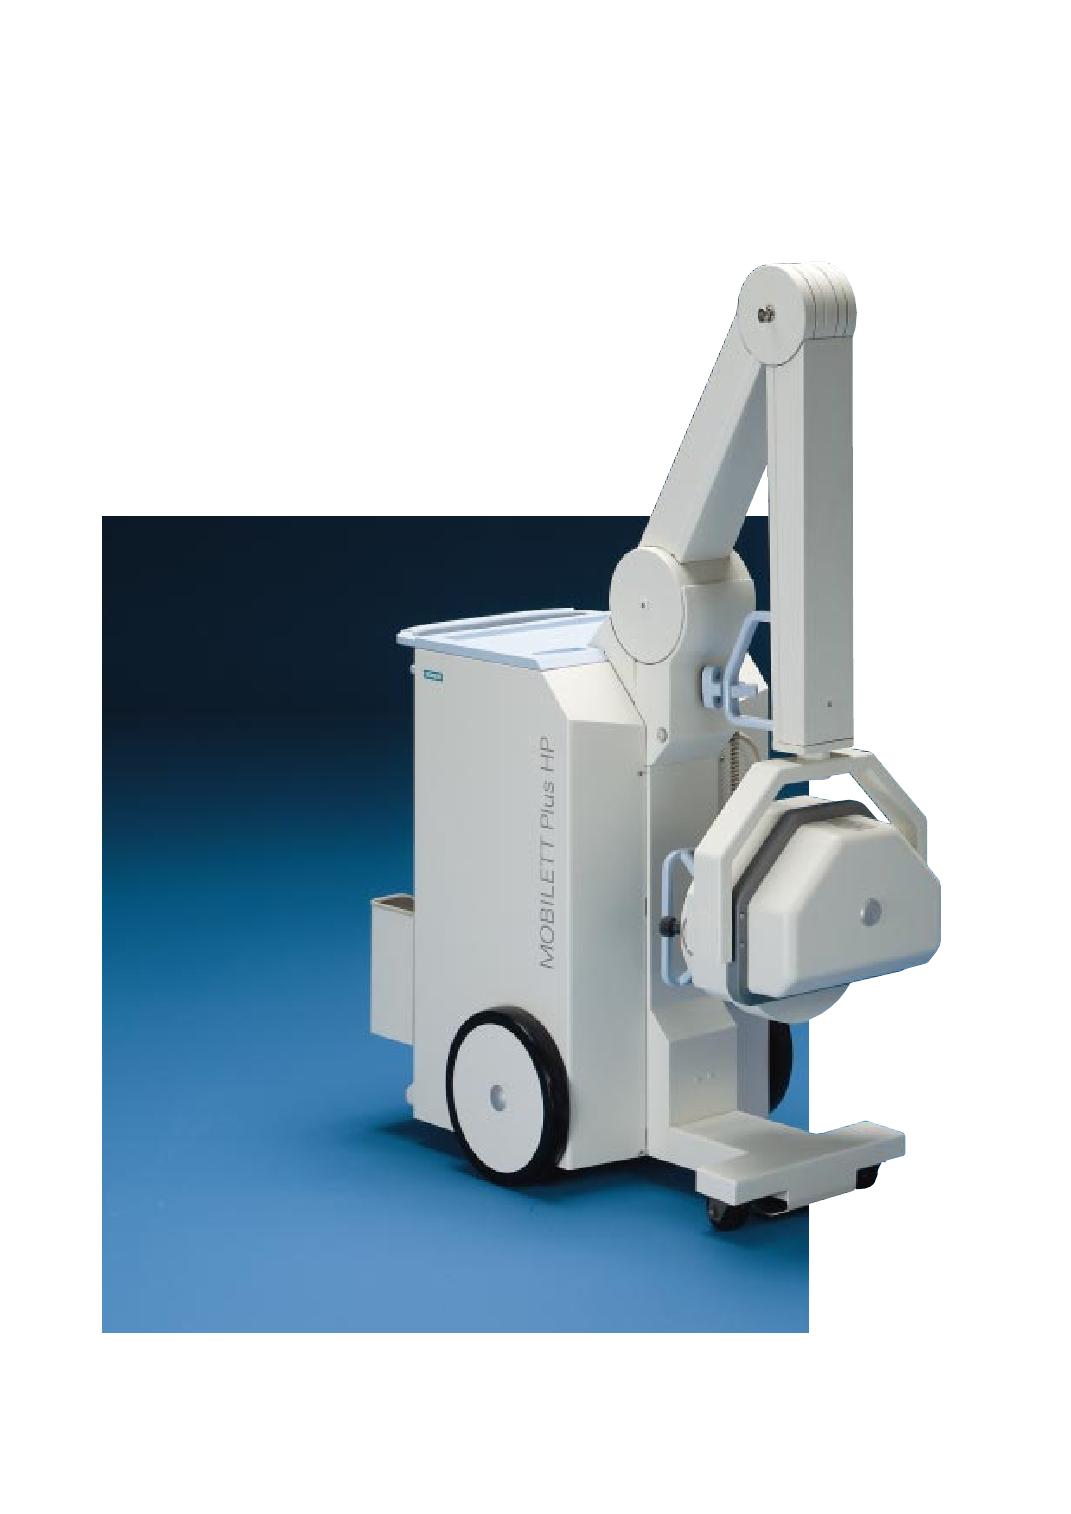 siemens mobilett plus hp jaco medical equipment rh jacomed com siemens mobilett plus hp service manual Service ManualsOnline